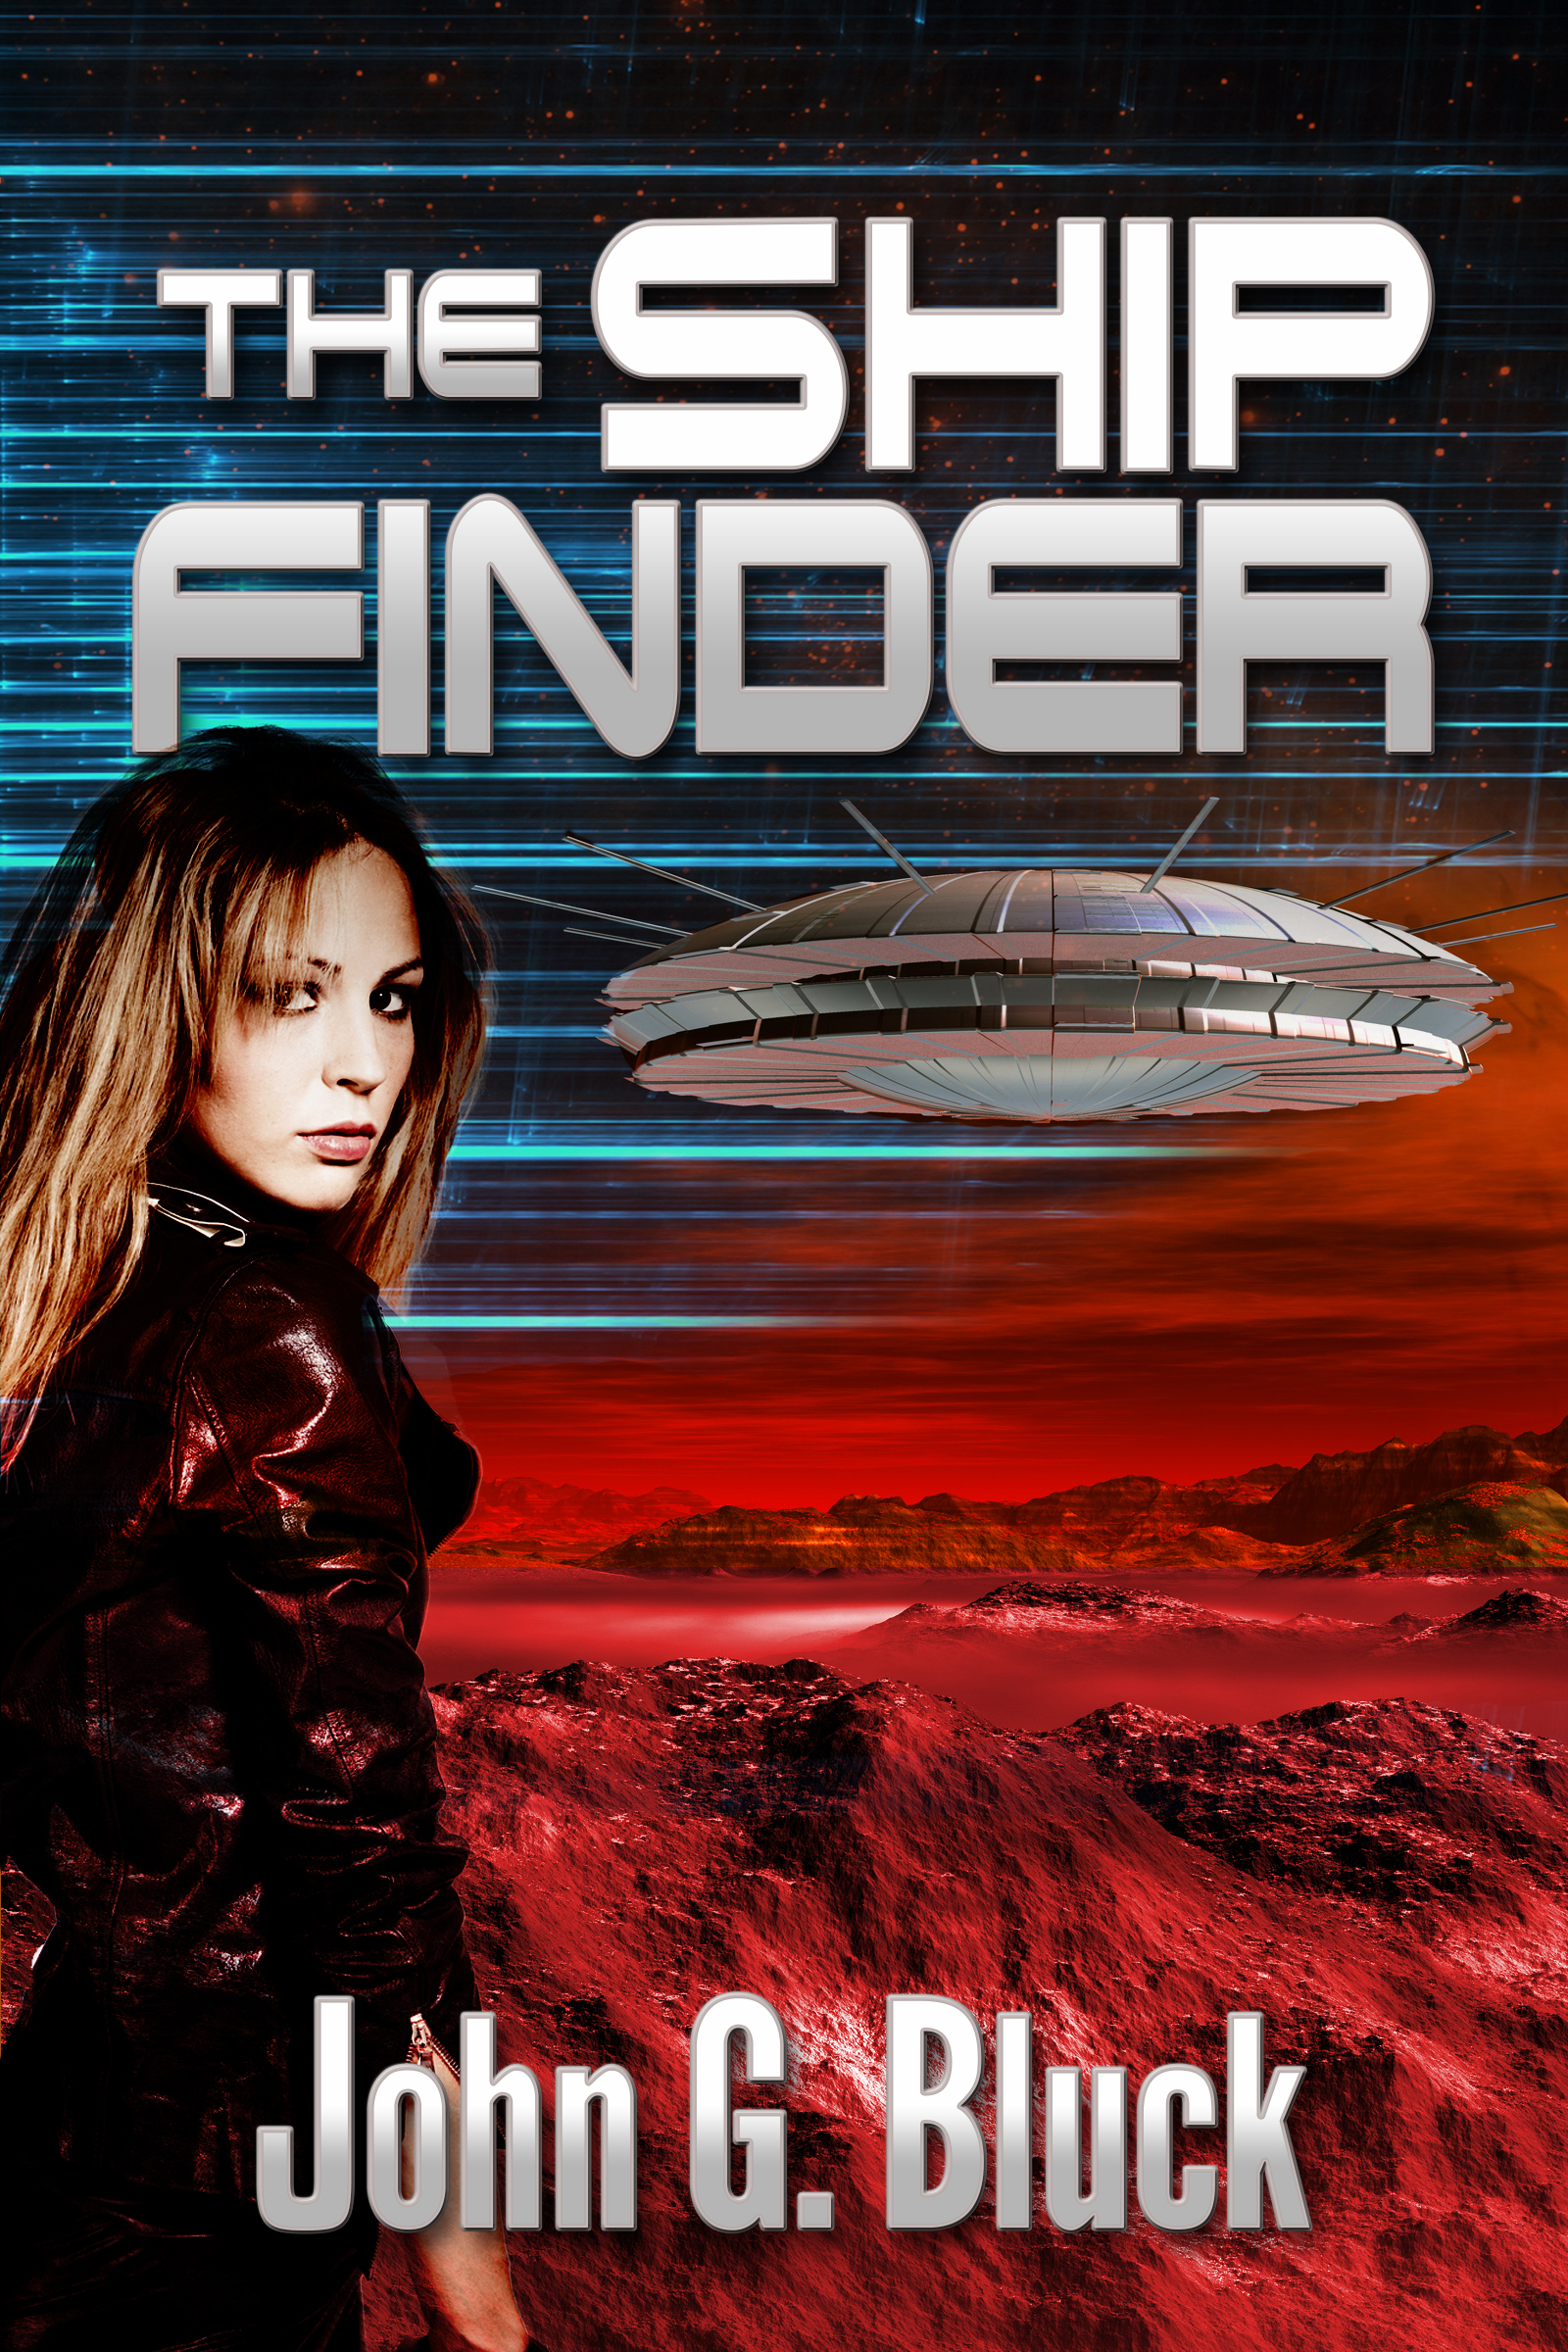 https://0201.nccdn.net/4_2/000/000/056/7dc/The-ship-Finder-for-Kindle4x6_400.jpg